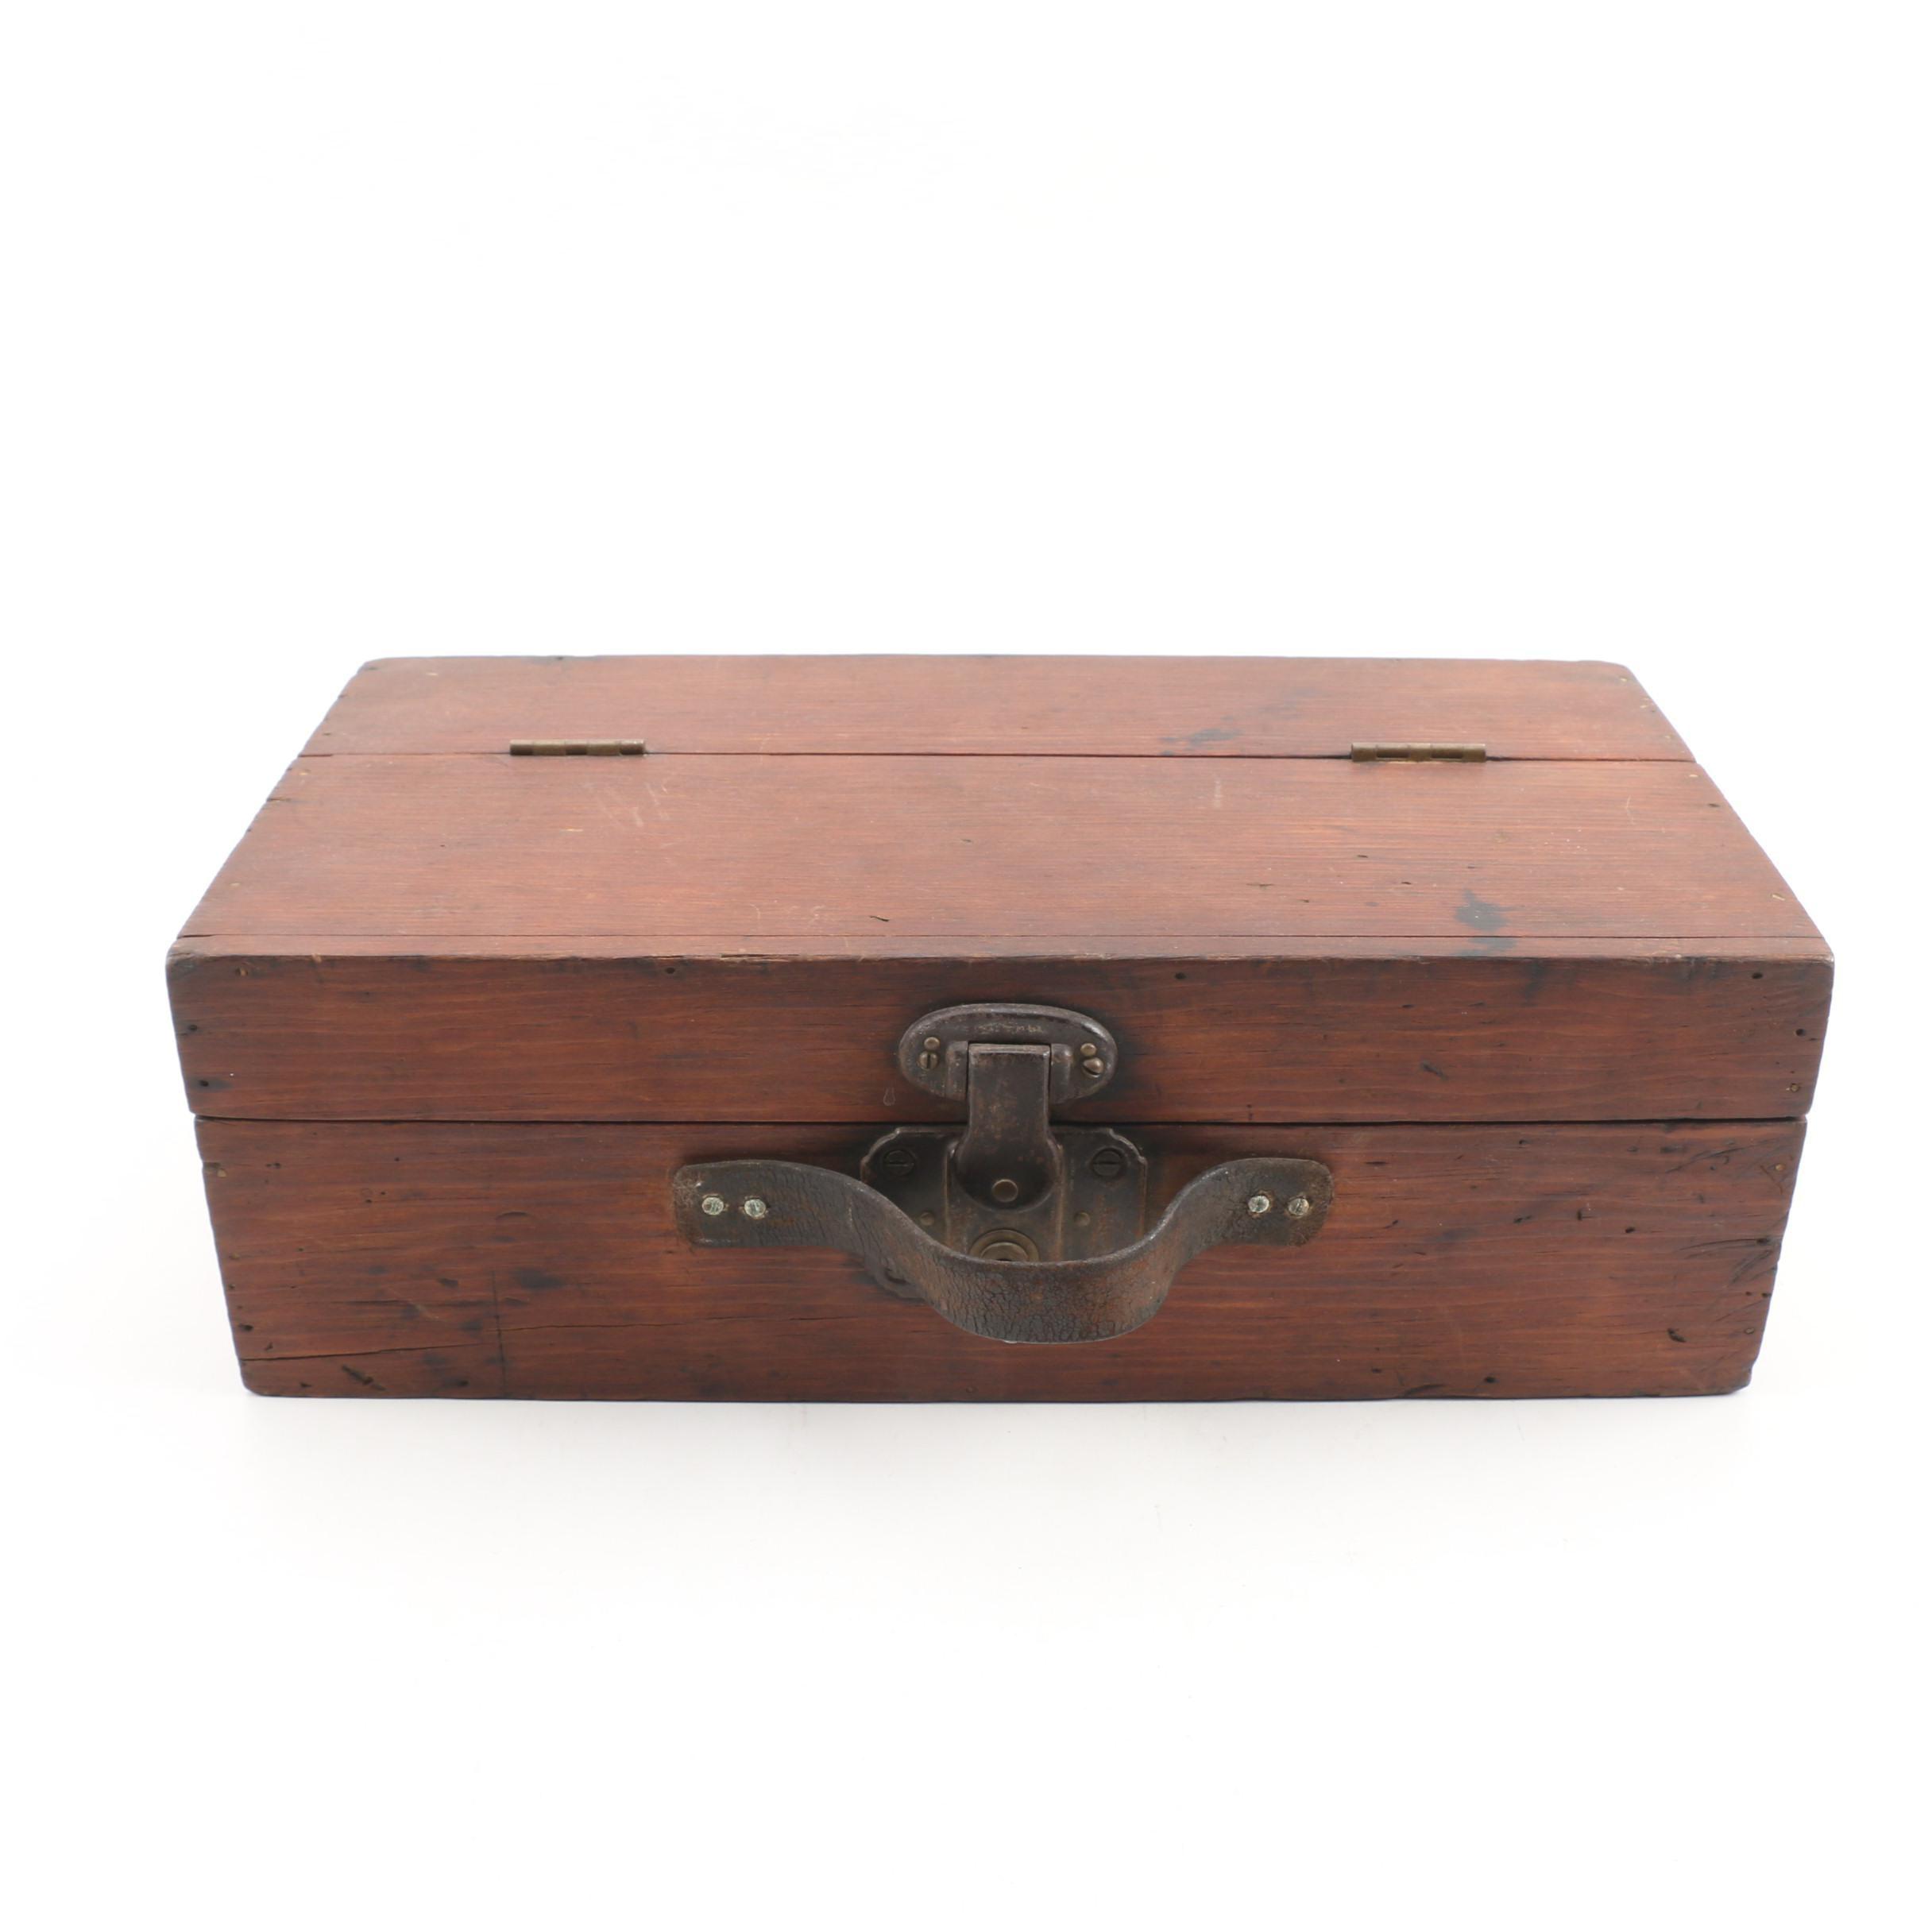 Hard Pine Tool Box, Early 20th Century